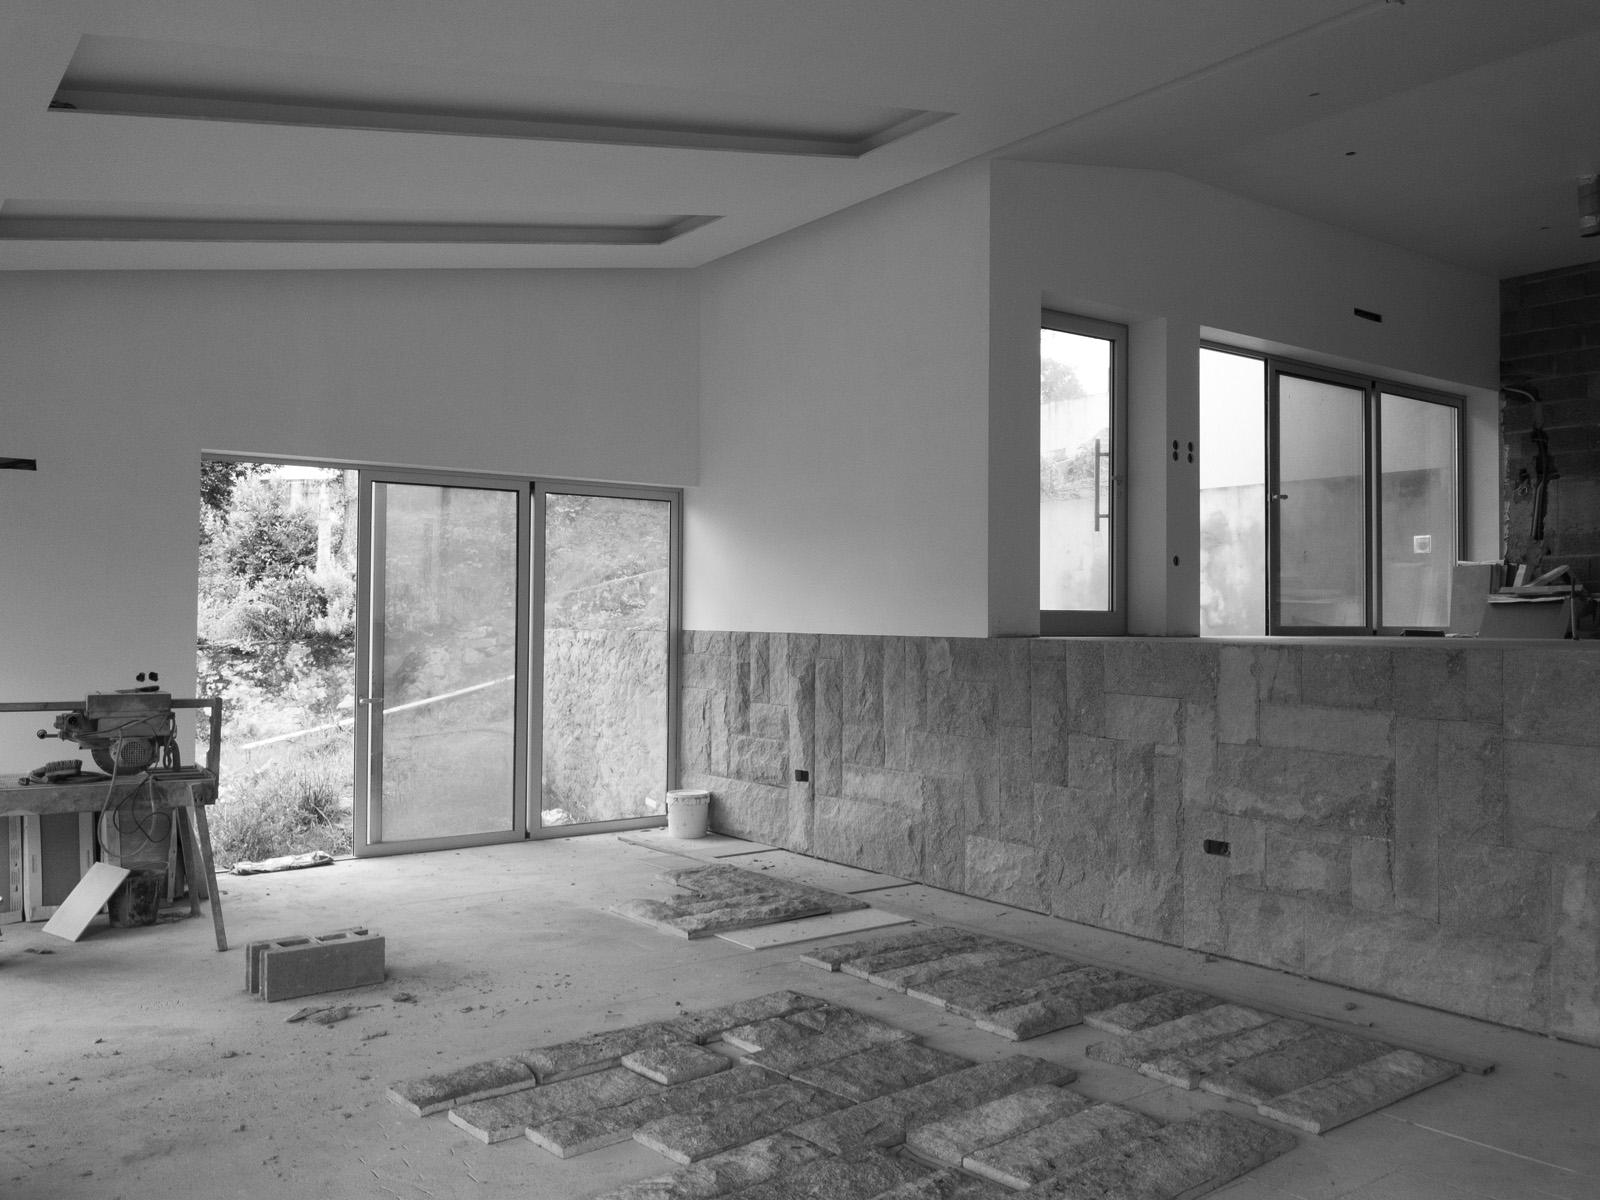 Moradia S+N - arquitectura - EVA evolutionary architecture - arquitectos porto - oliveira de azemeis (23).jpg